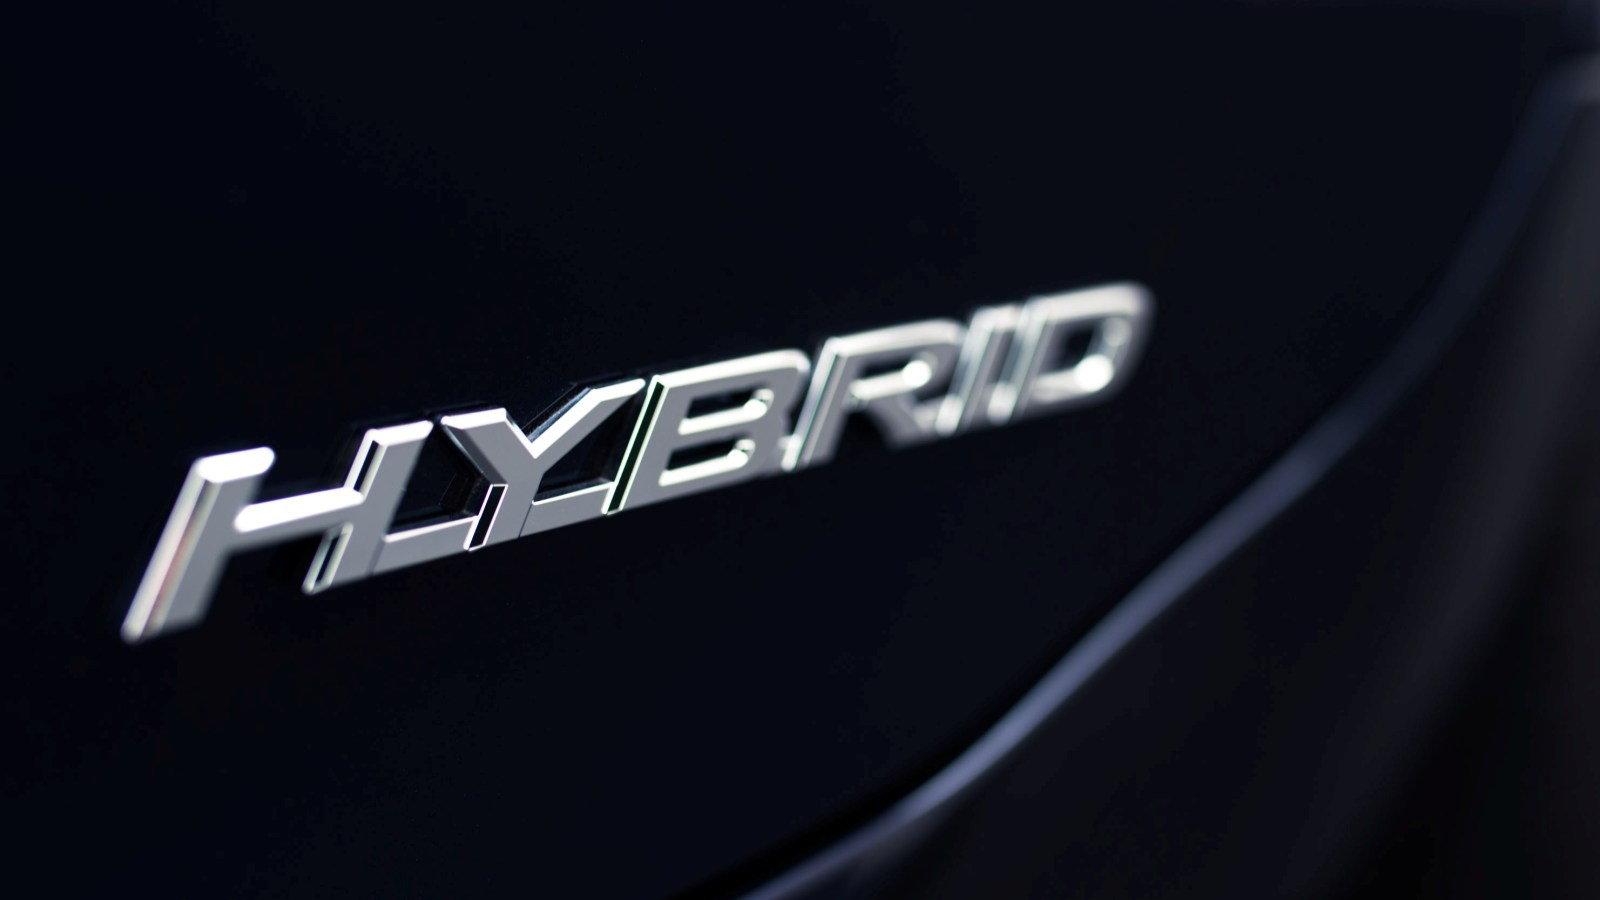 A Visit With the Lexus ES 300h Hybrid